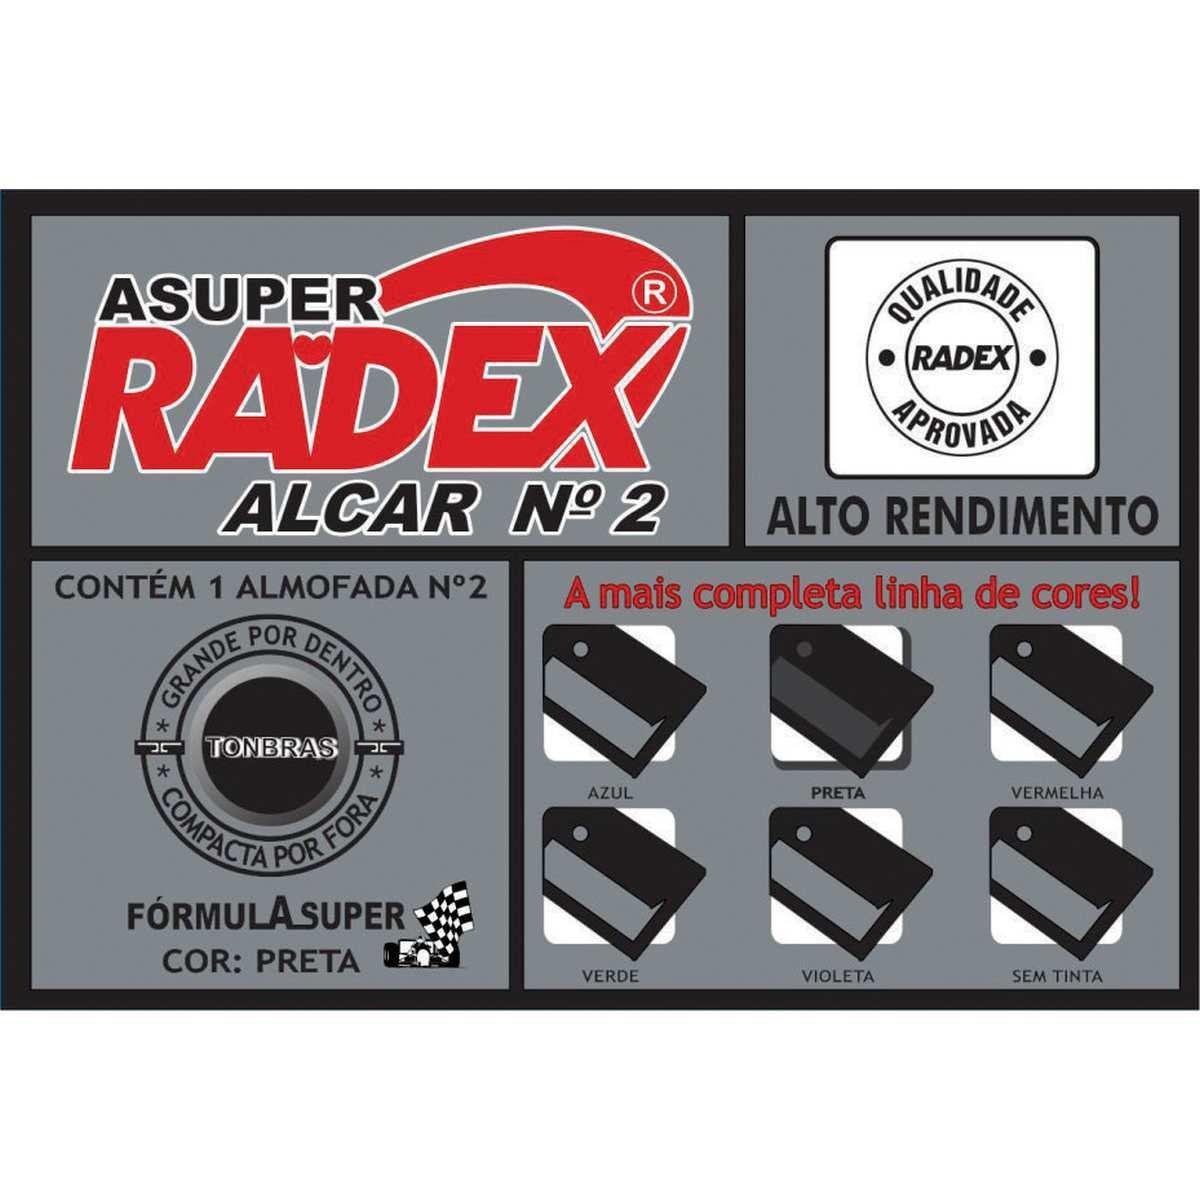 Almofada para Carimbo N°2 - Radex